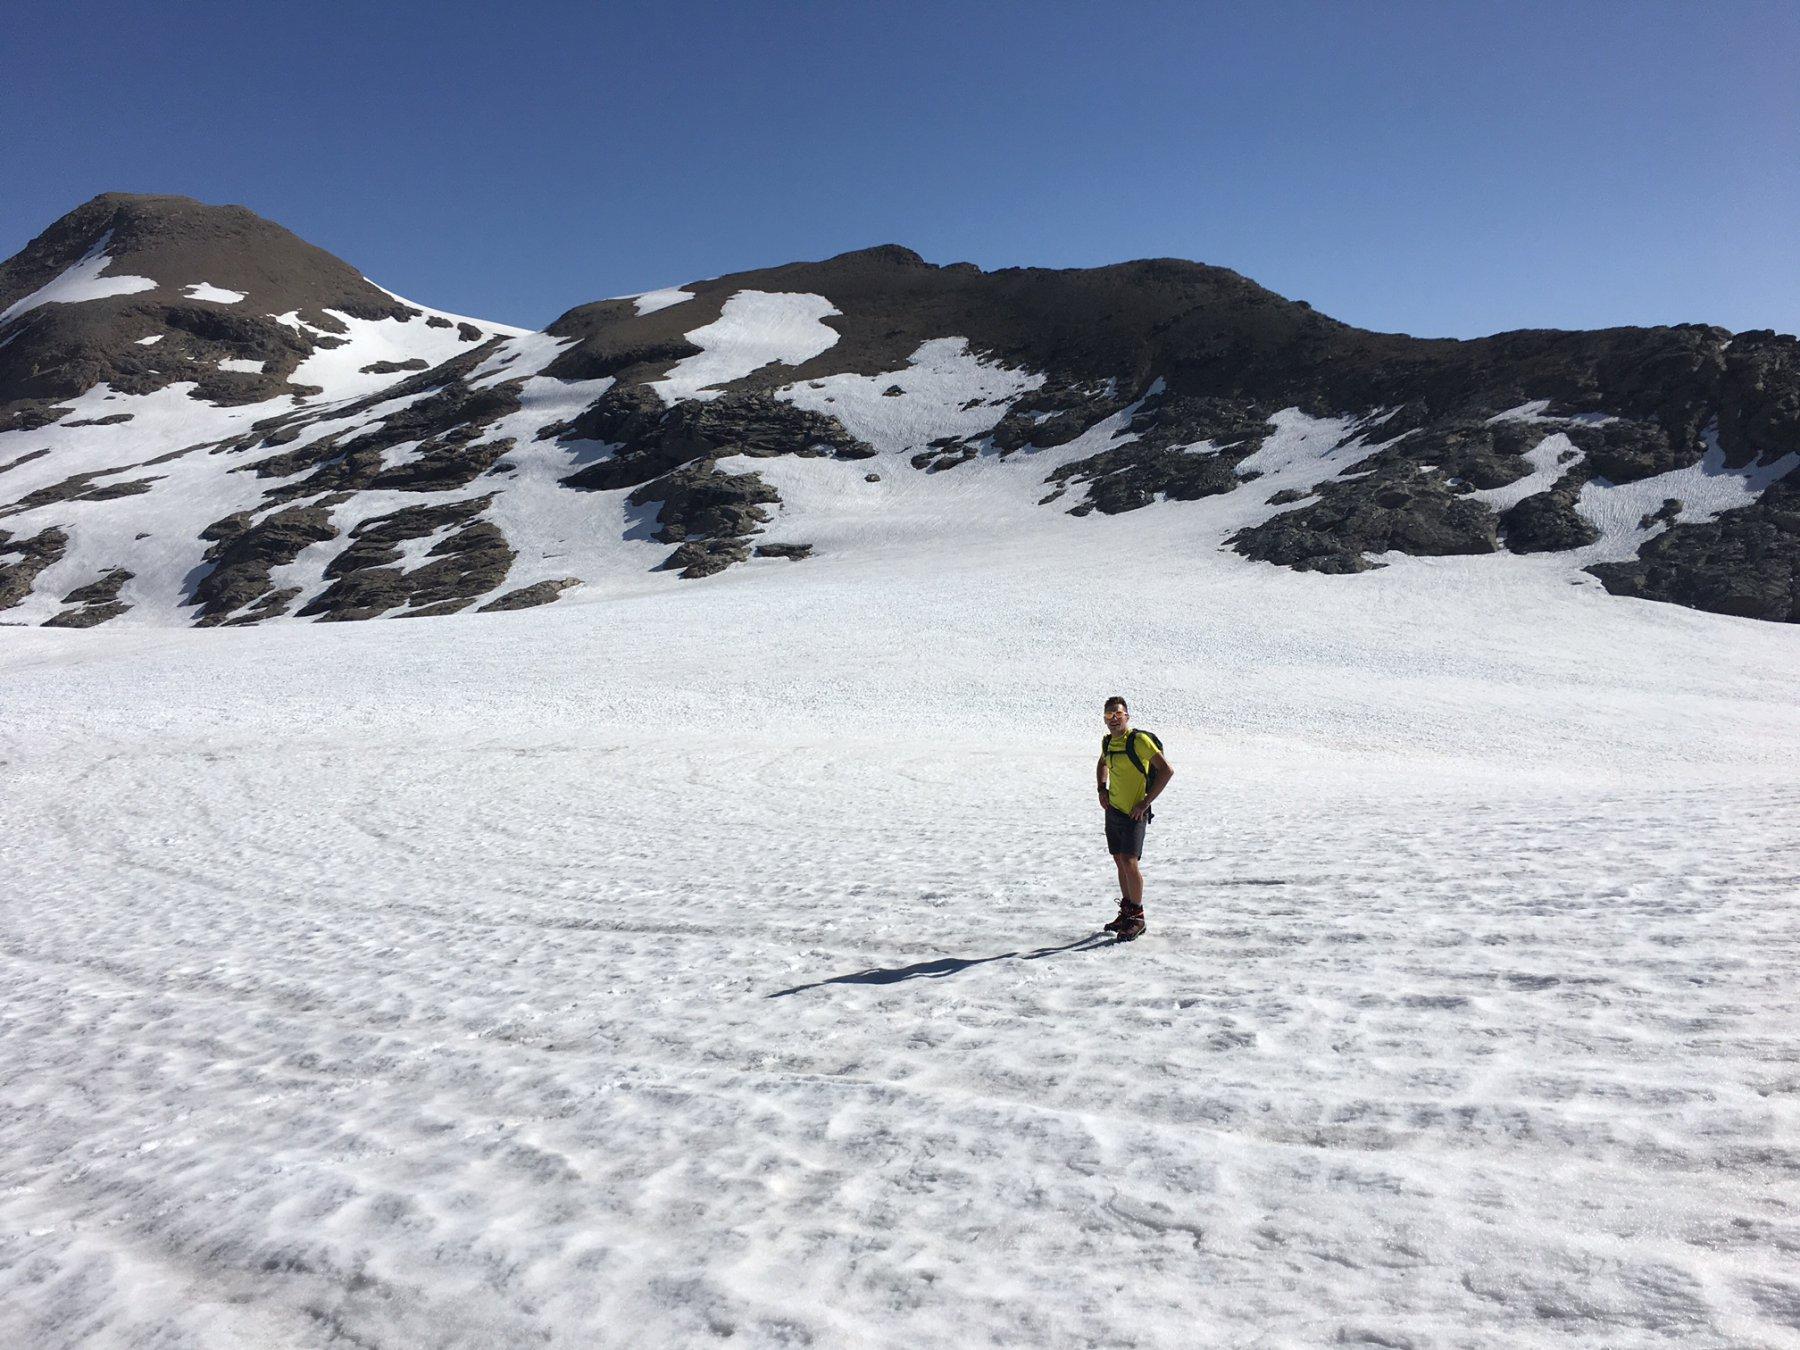 Gian sull ghiacciaio